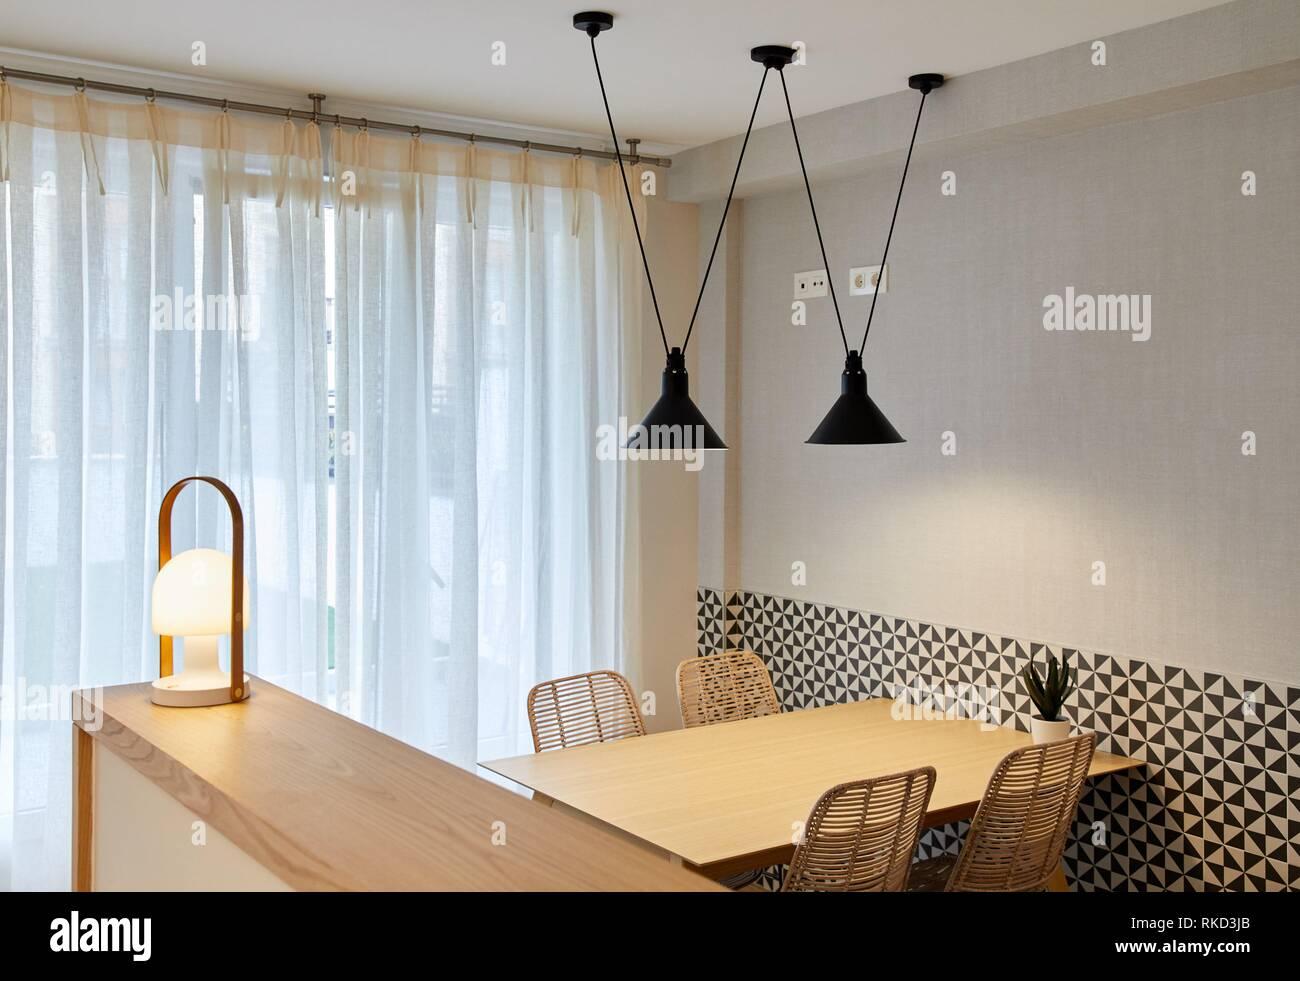 Dining room and kitchen, illumination, Interior decoration of housing, Oñati, Gipuzkoa, Basque Country, Spain, Europe - Stock Image